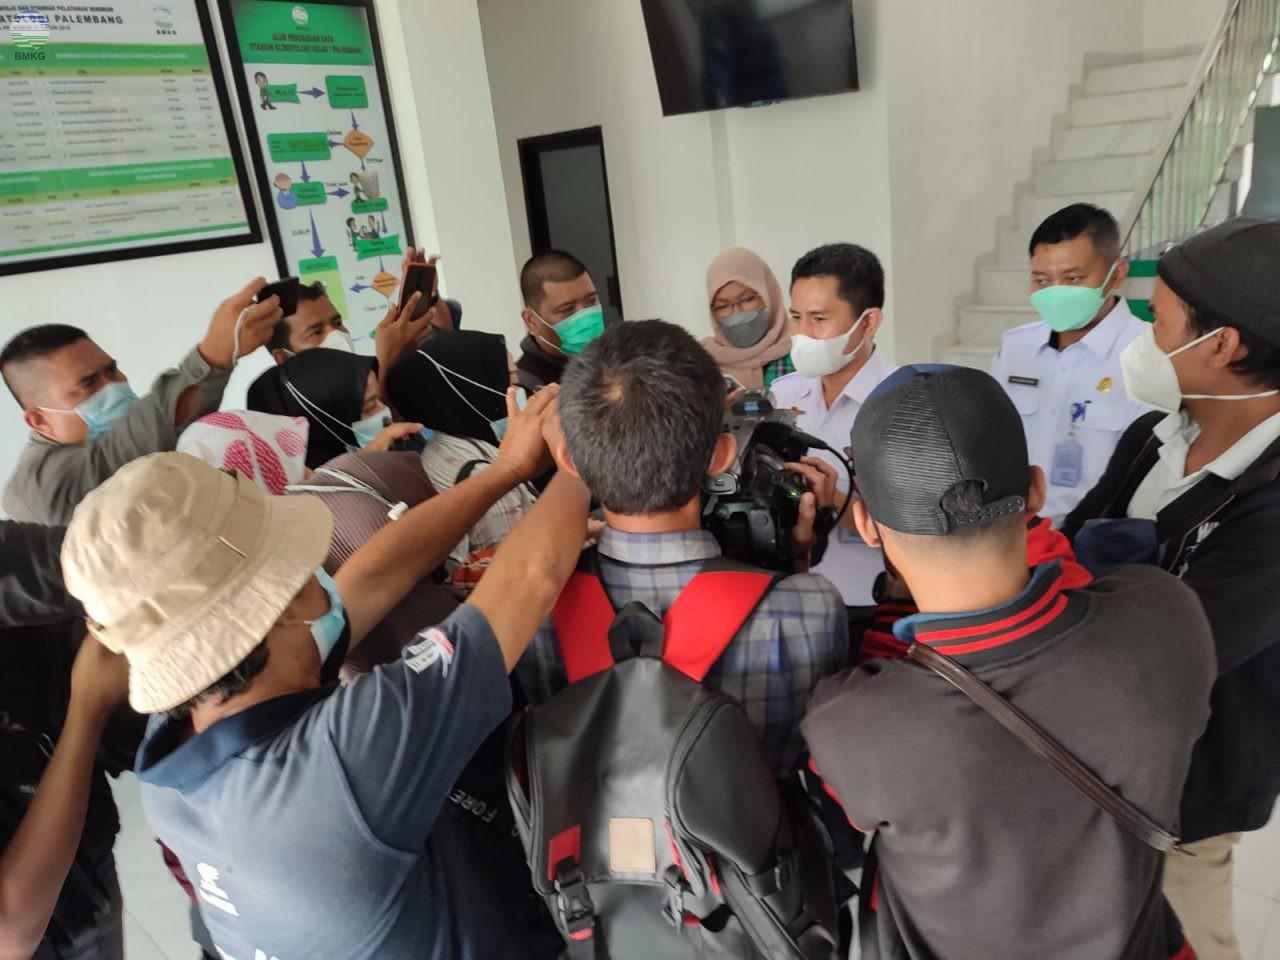 Press Release Monitoring Musim Kemarau 2021 dan Prakiraan Awal Musim Hujan 2021/2022 di Wilayah Sumatera Selatan